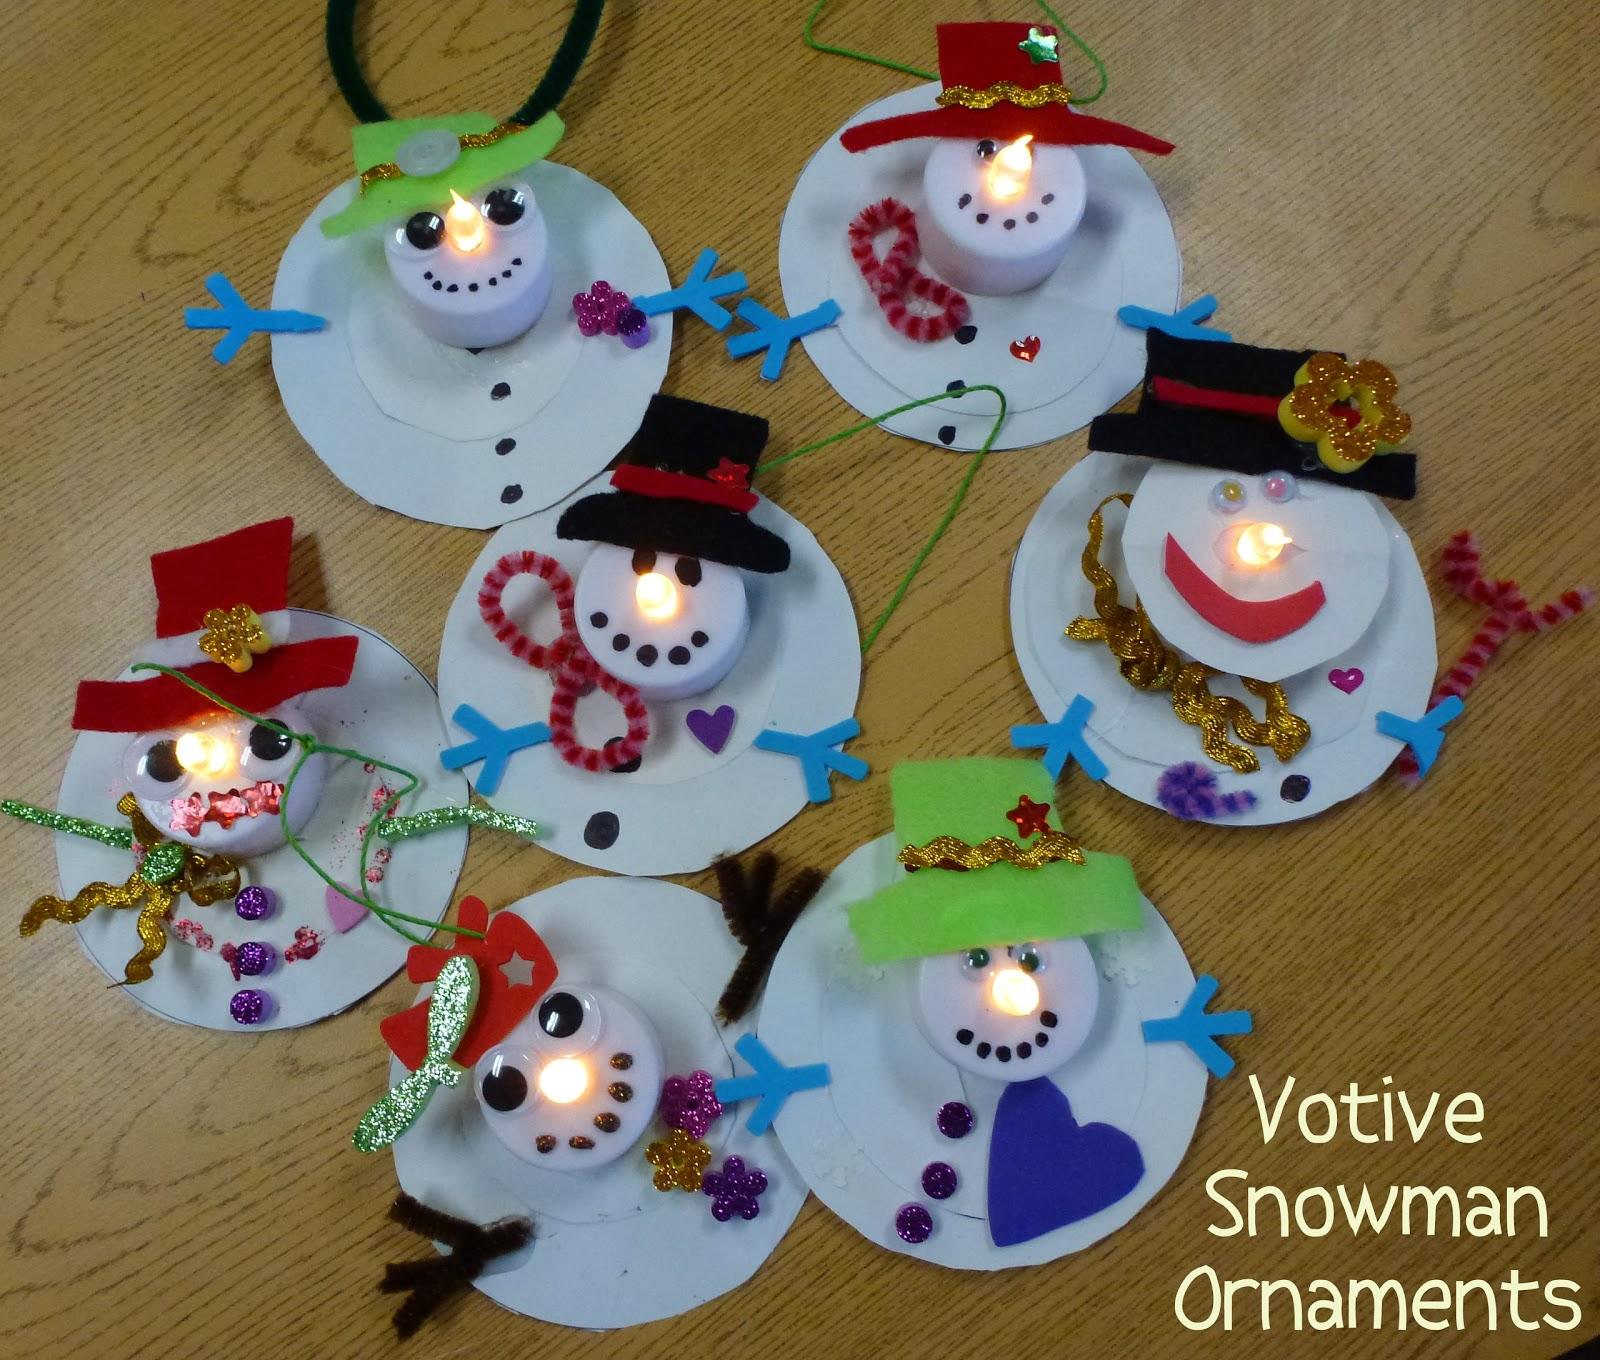 Christmas decoration ideas for kids - Christmas Crafts For Kids Ornament Snowman Votive Snowman Ornaments Choices For Children